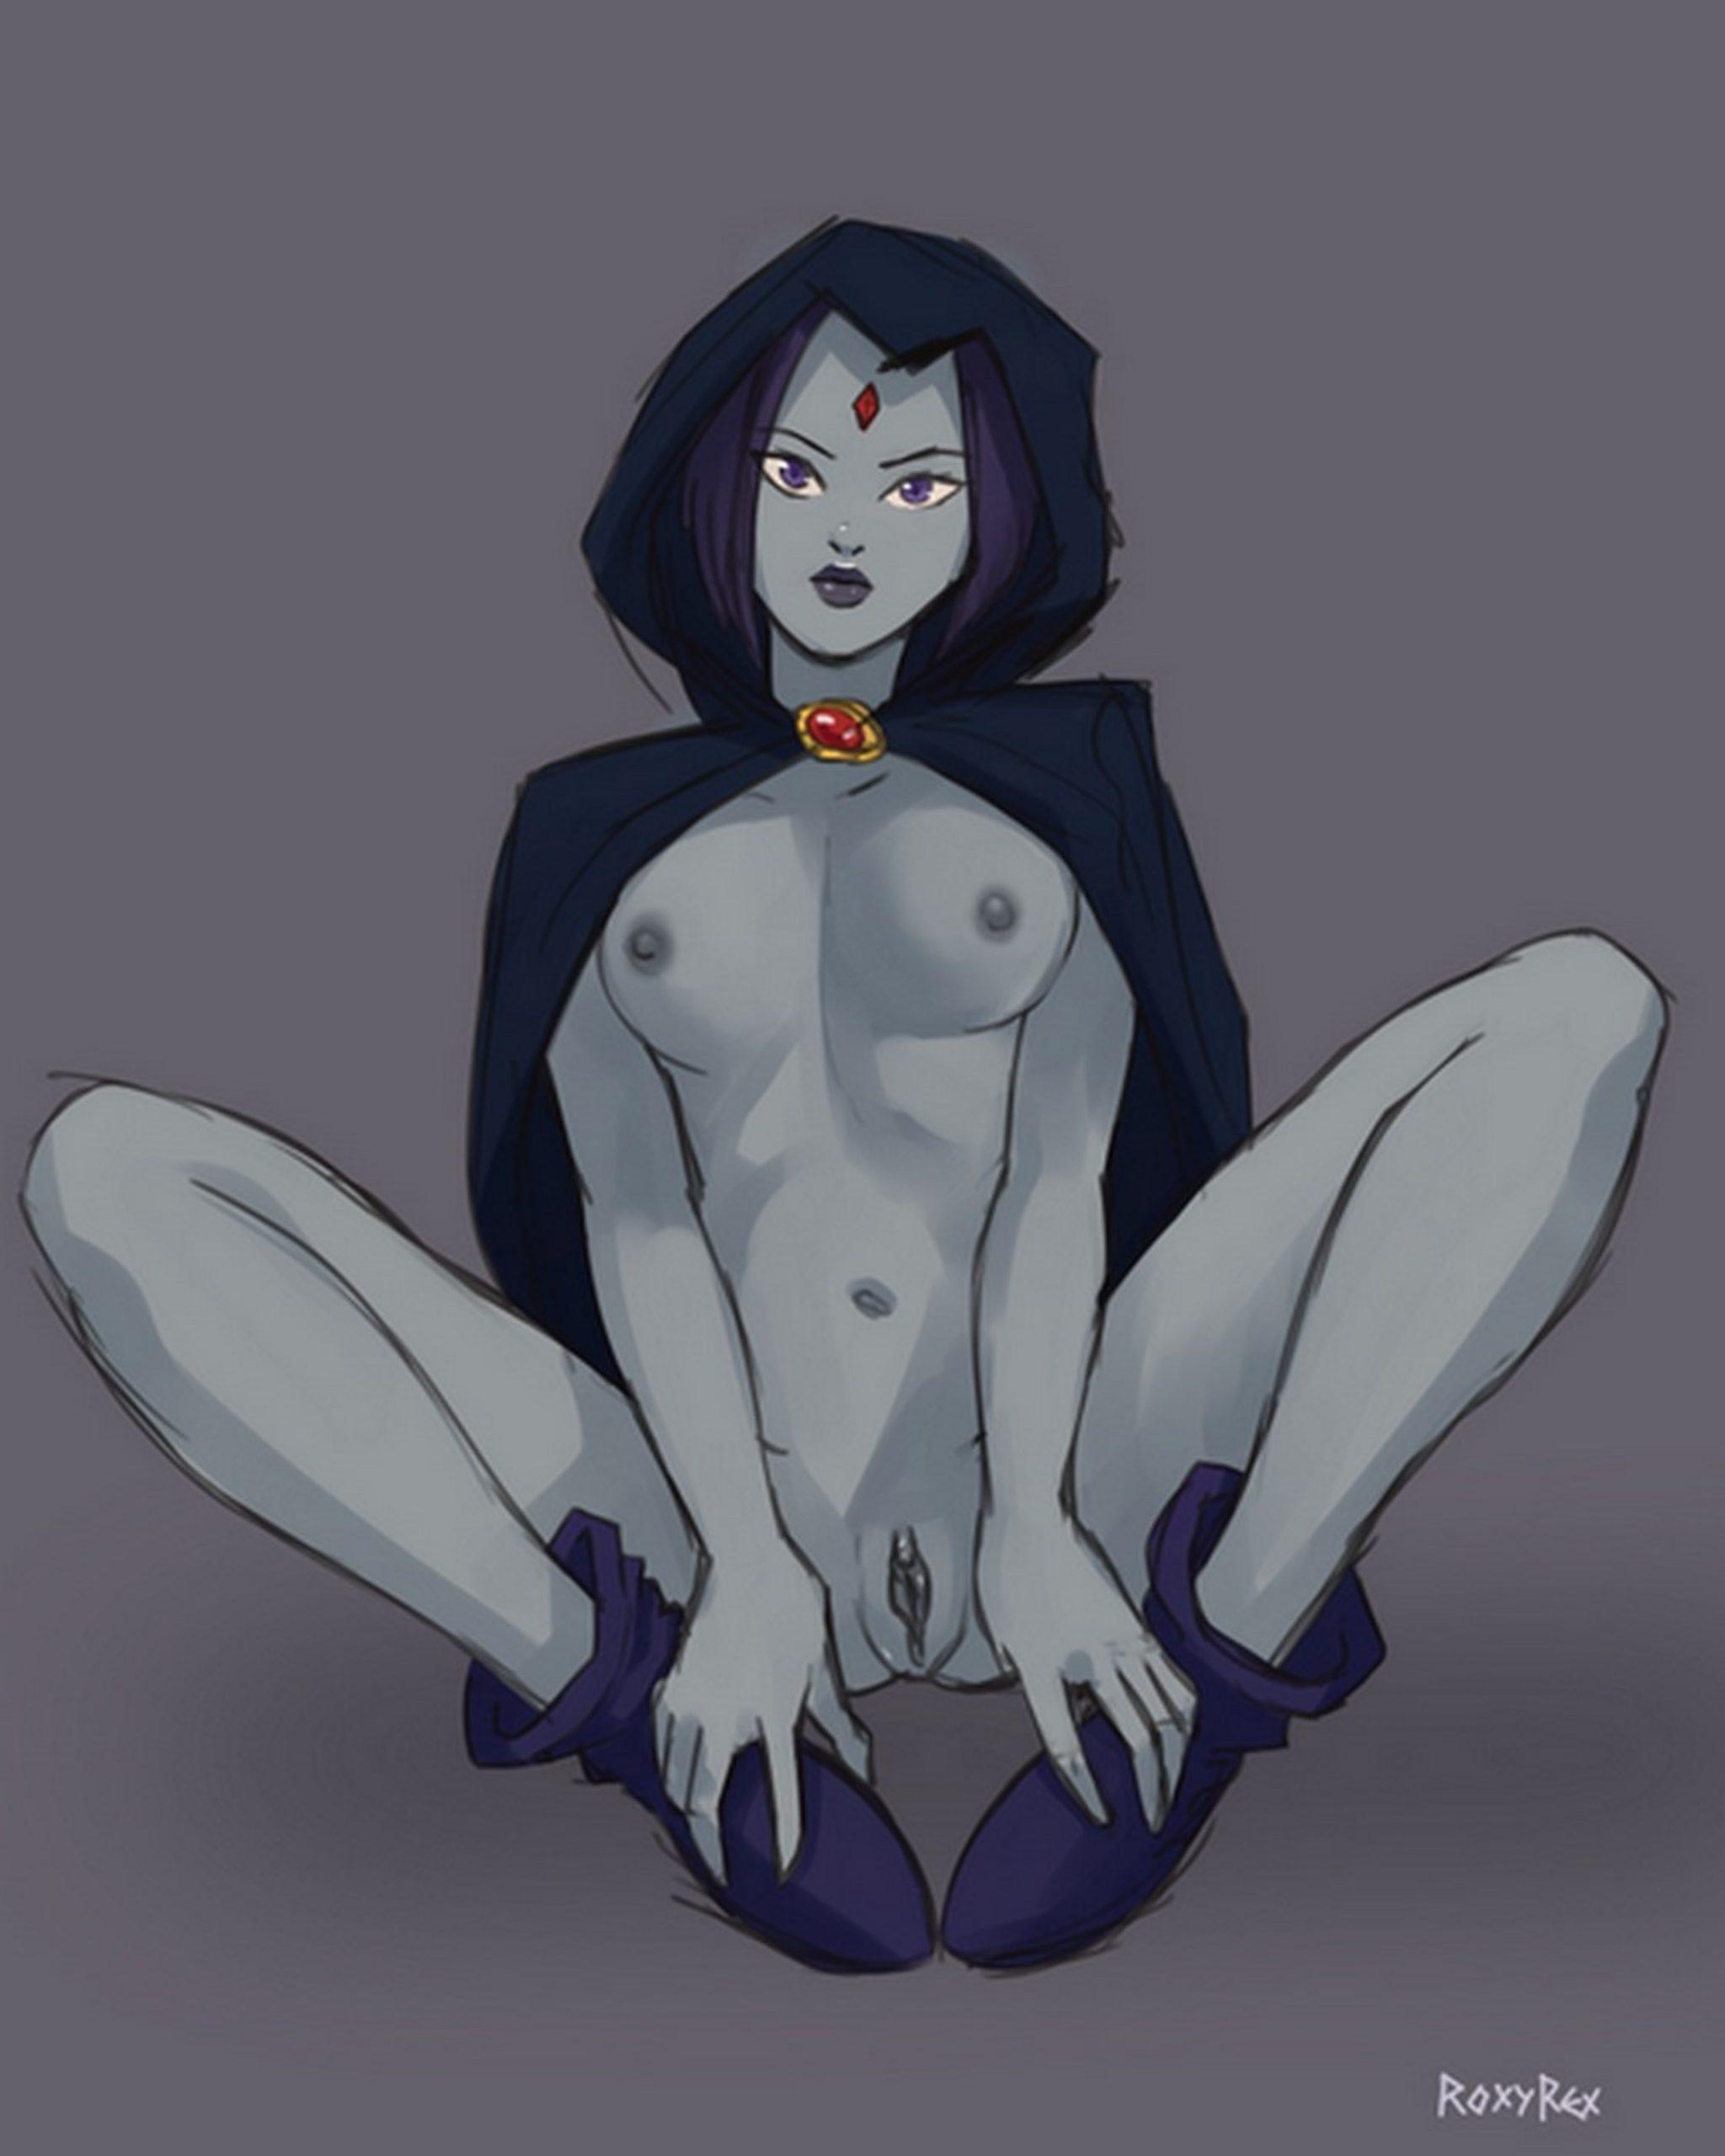 Roxyrex - Teen Titans - Poor Raven